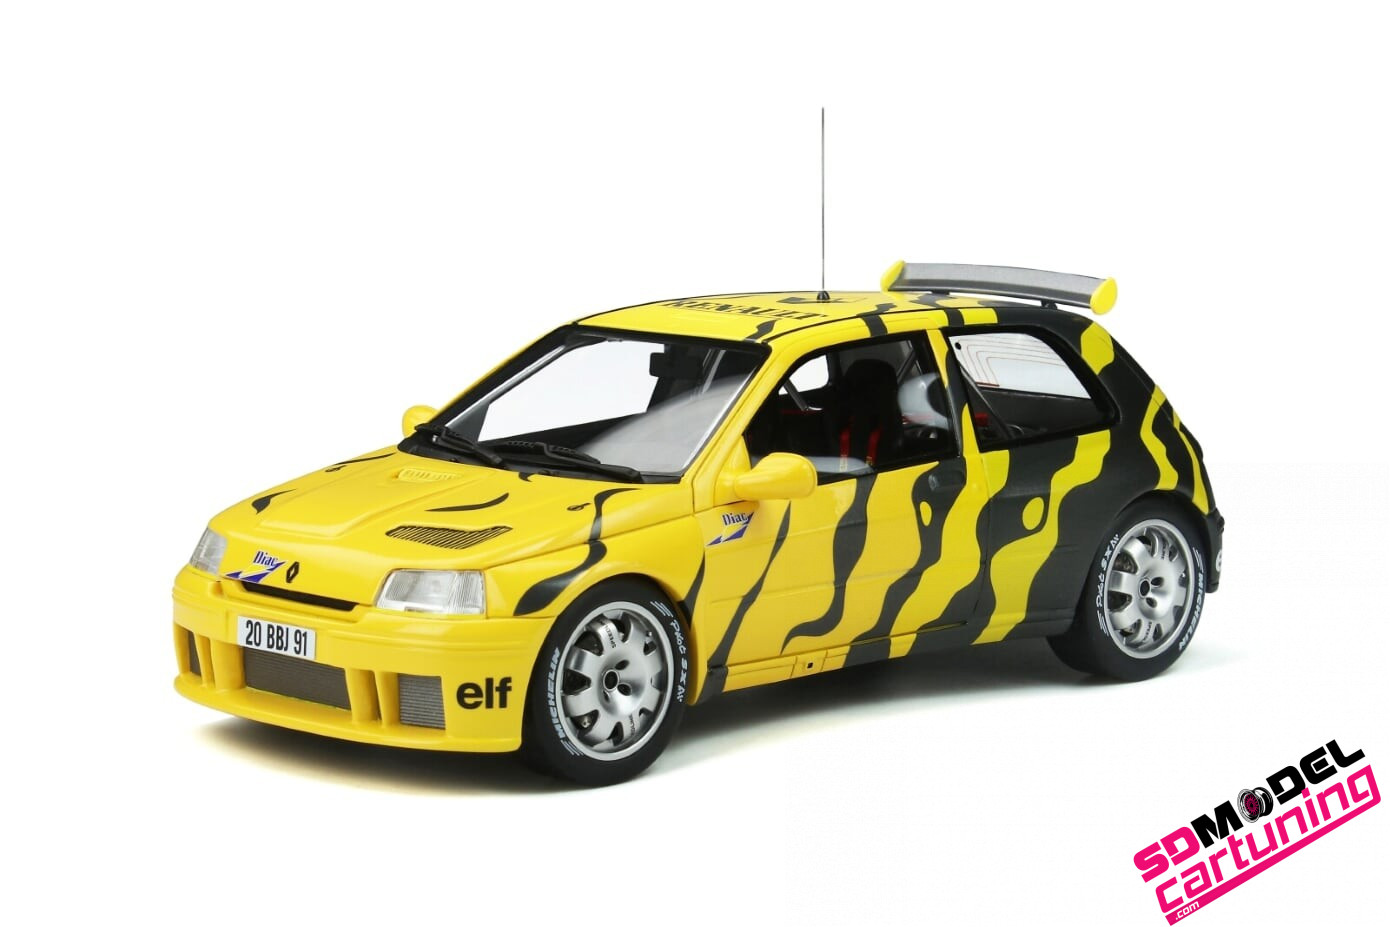 1:18 Renault Clio Maxi rally presentation